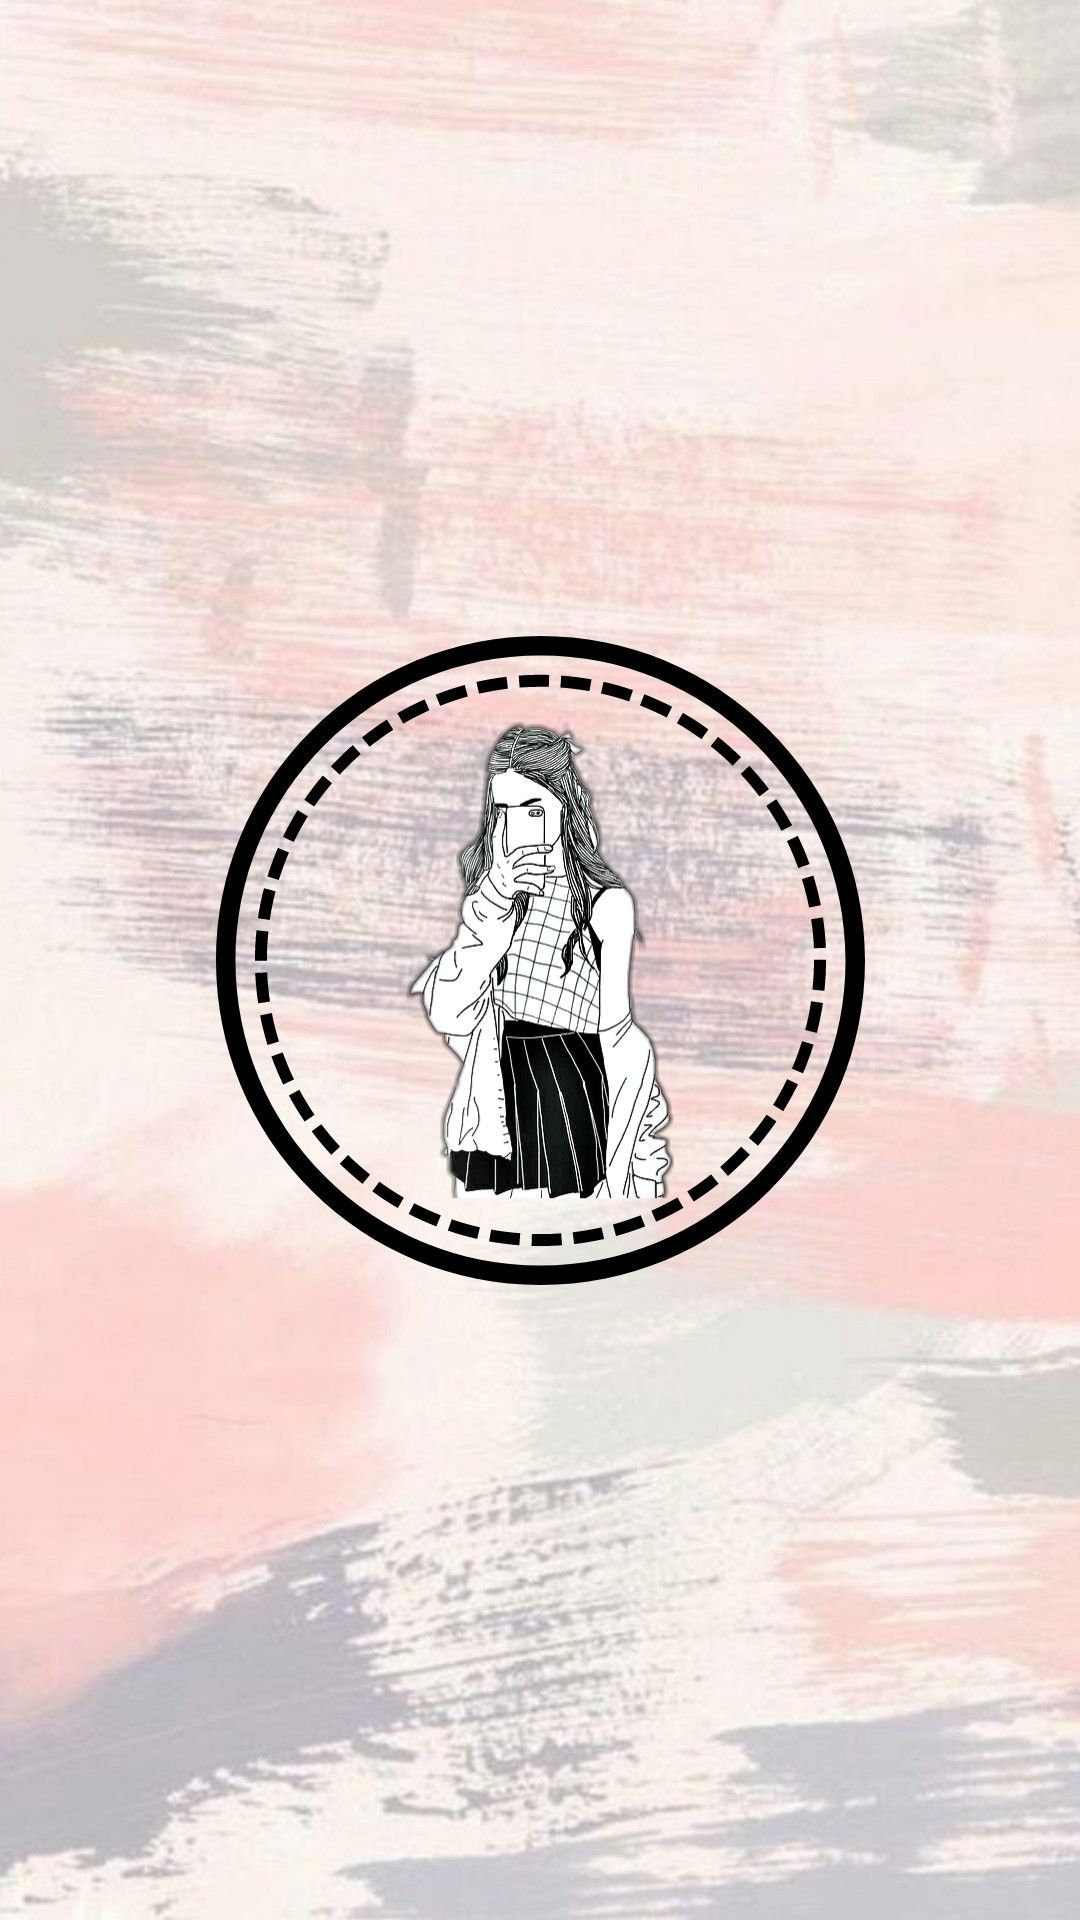 Pin By Aylen On Meus Pins Salvos In 2020 Instagram Prints Instagram Icons Instagram Logo